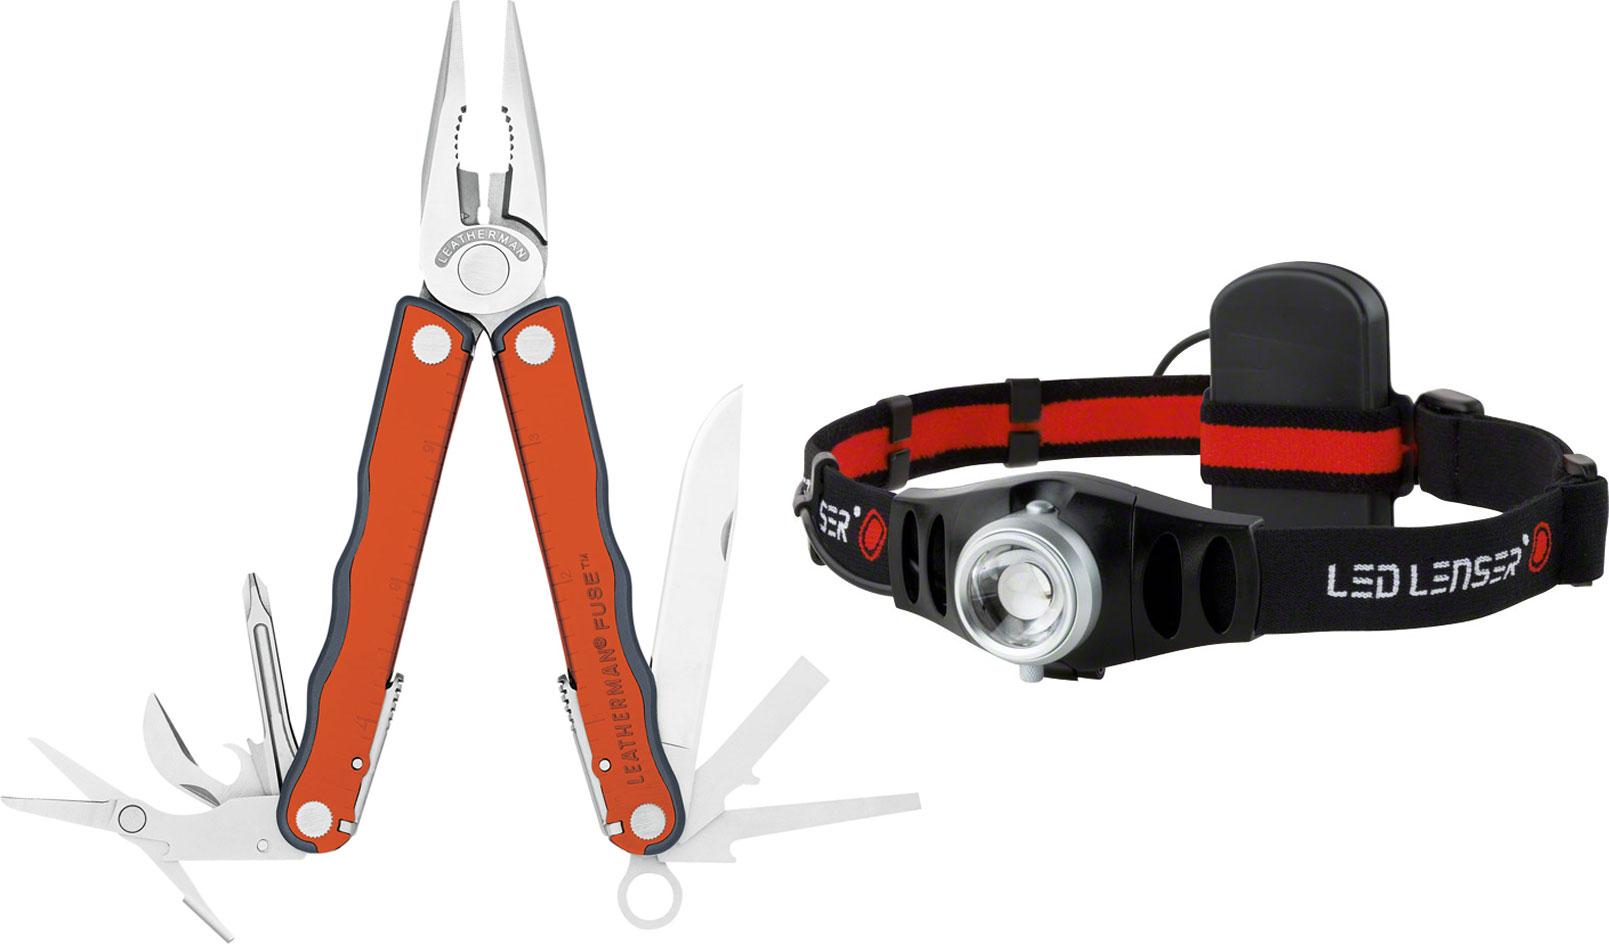 Leatherman Fuse Full-Size Orange Multi-Tool and LED Lenser H5, Nylon Sheath